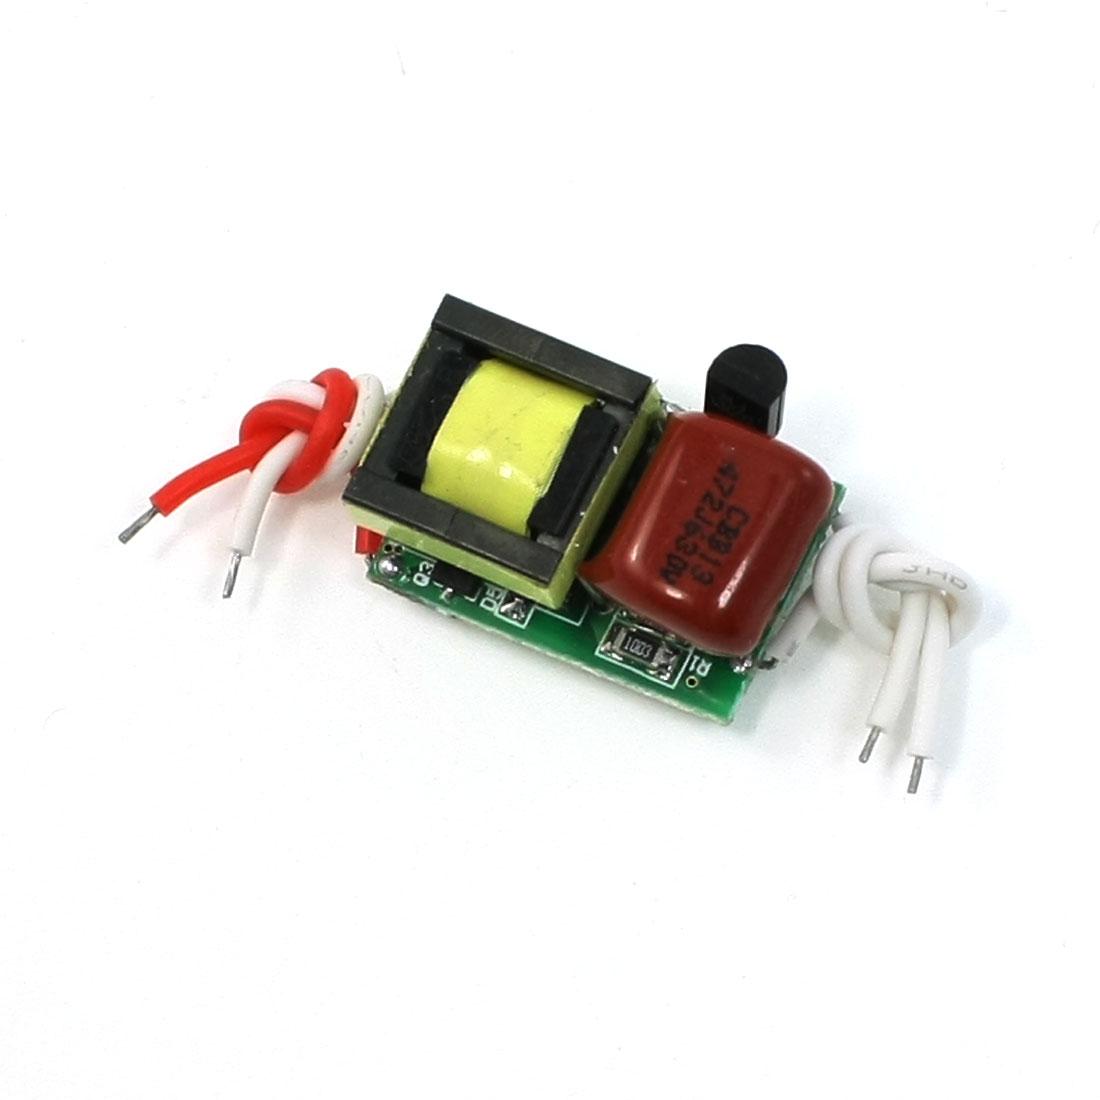 AC 110-220V DC 8-11V 300mA Power Supply Adapter for 4x1W LED Strip Light